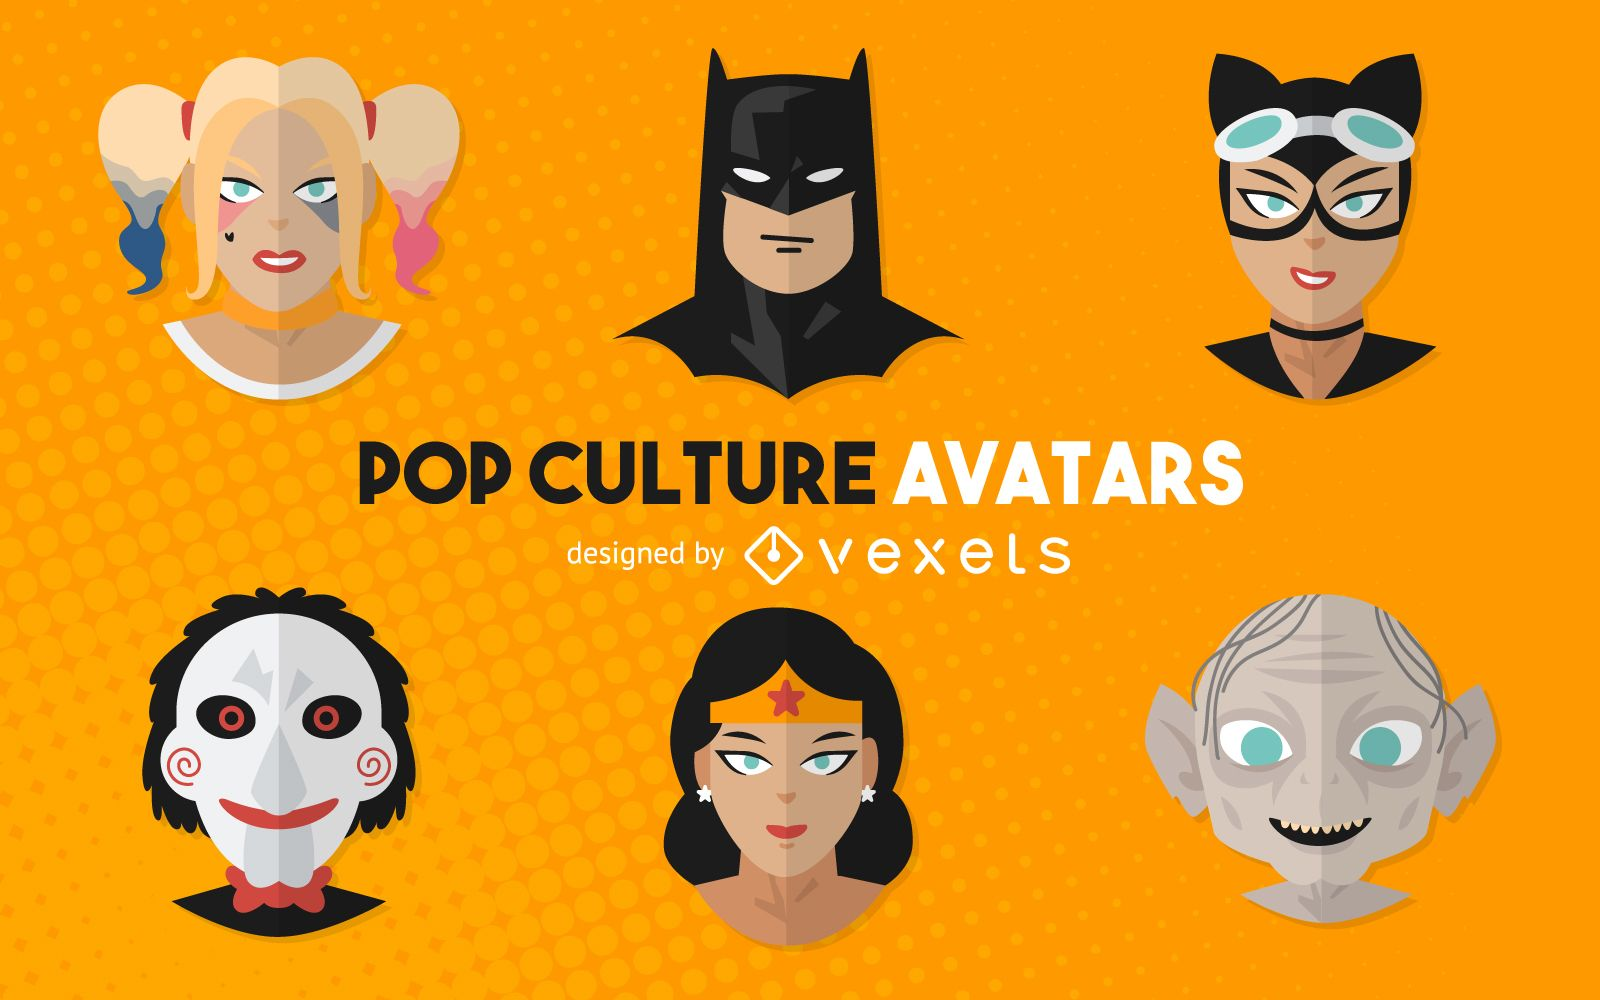 Ilustraciones de pop culture movie avatars